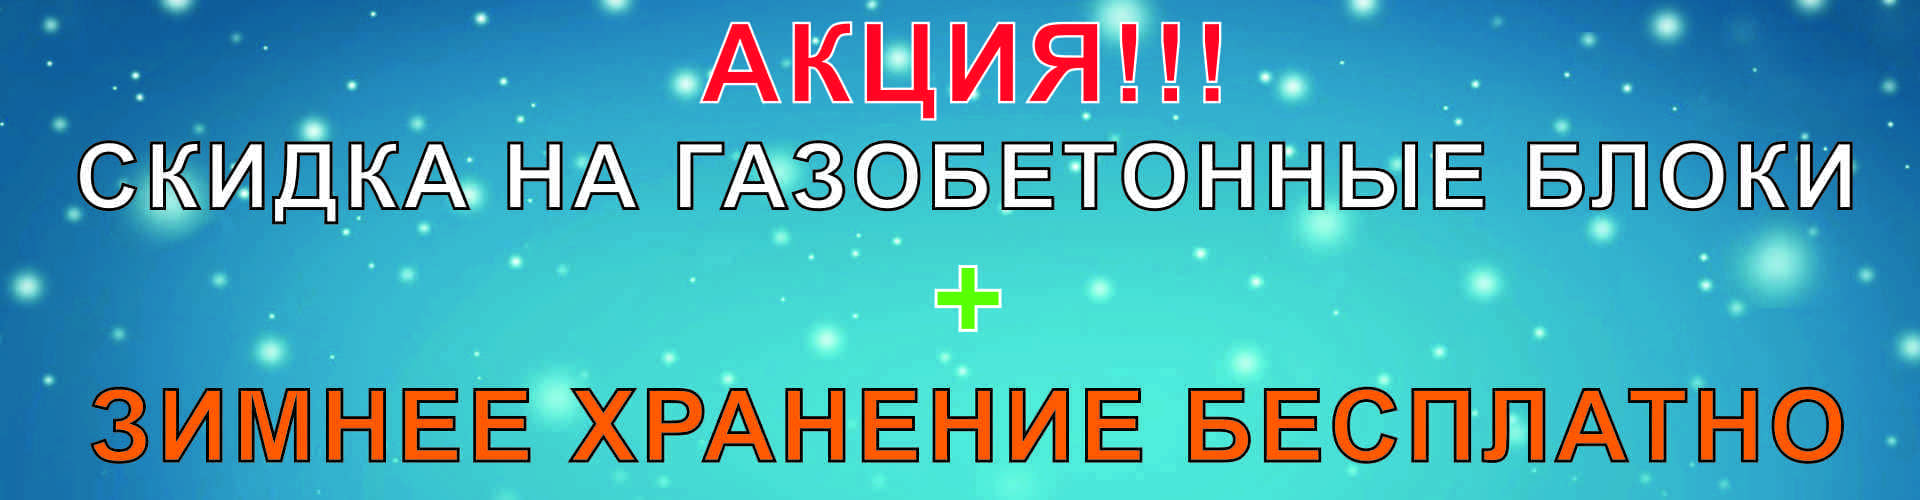 hranenie kirovskij3